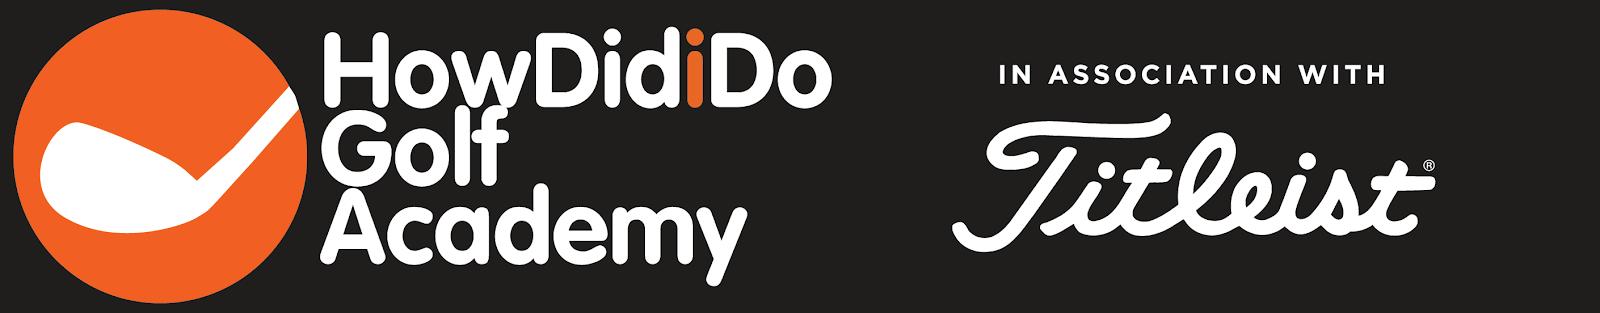 HDiD Golf Academy